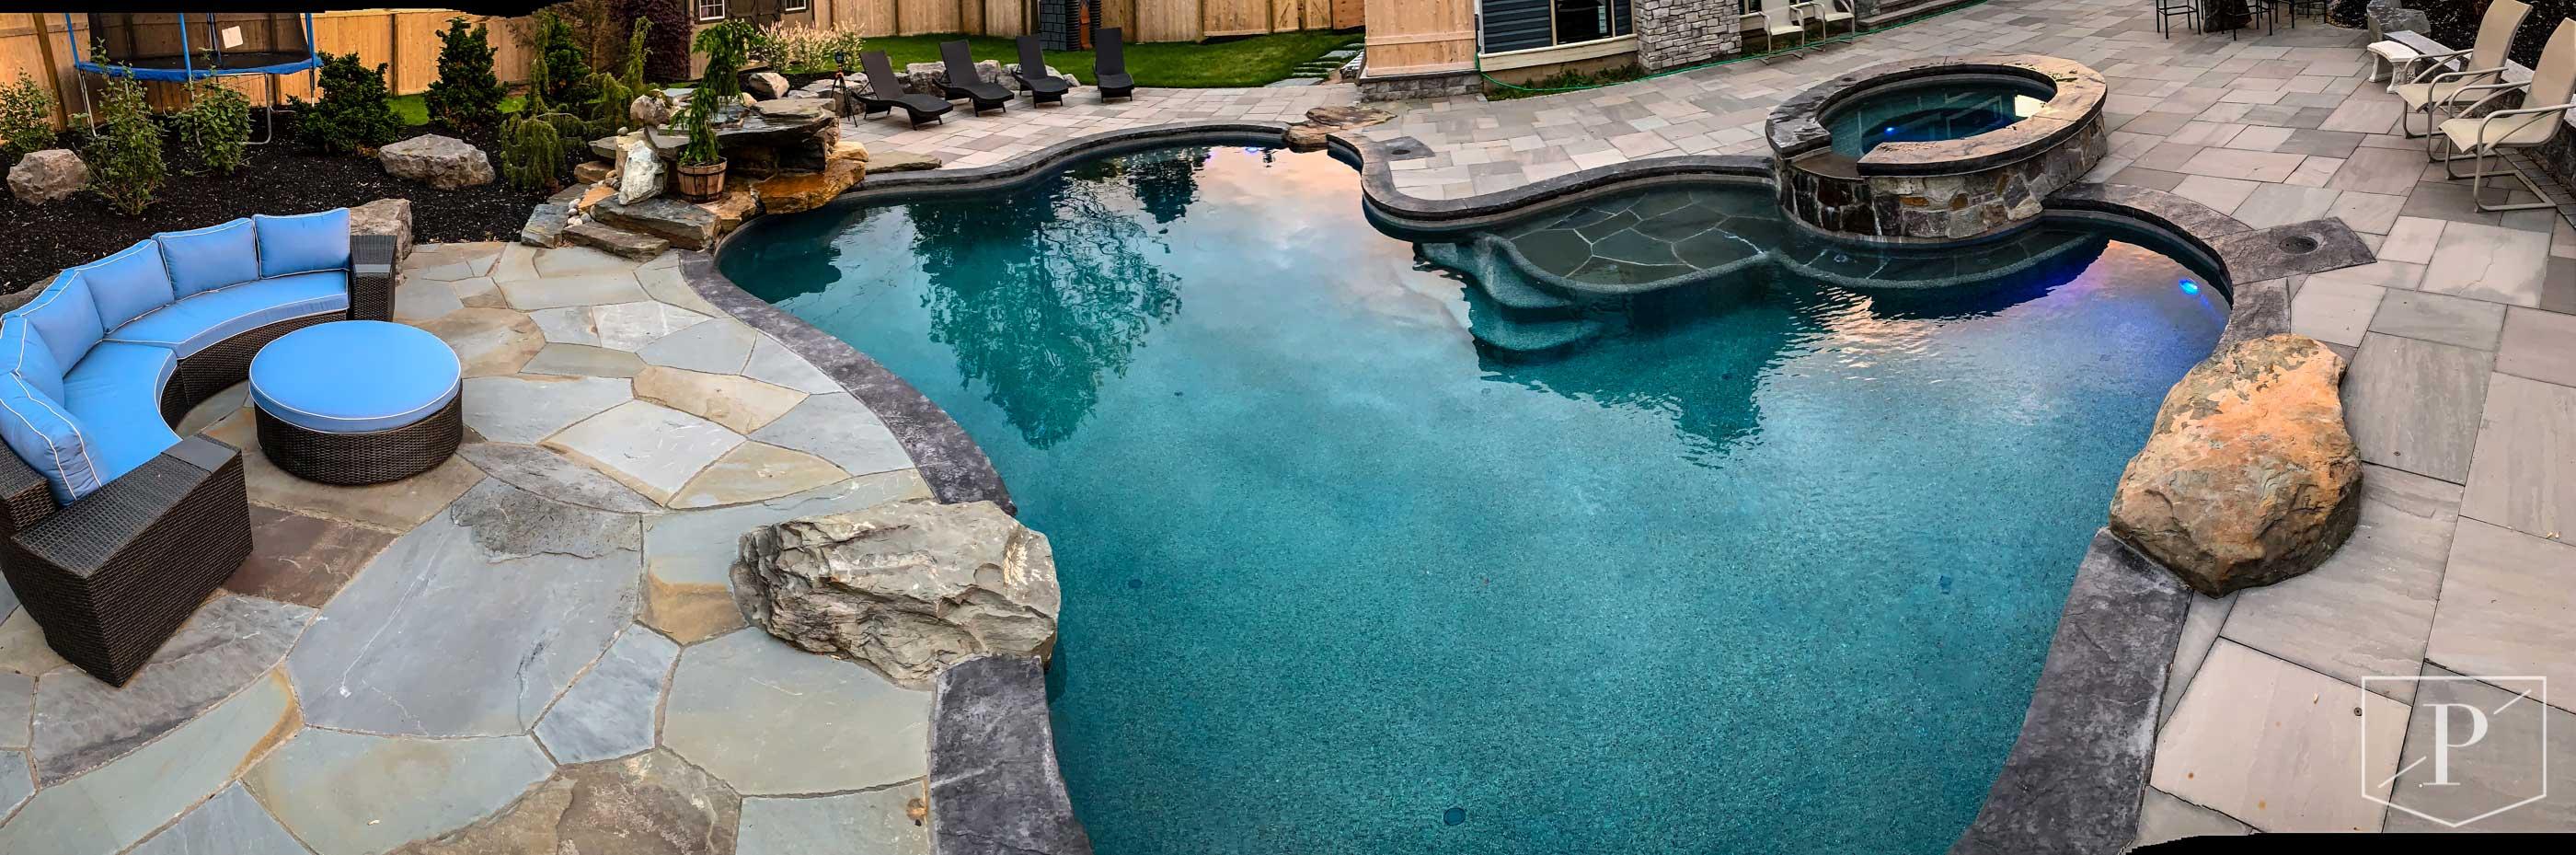 Main Home - Precision Pool & Spa